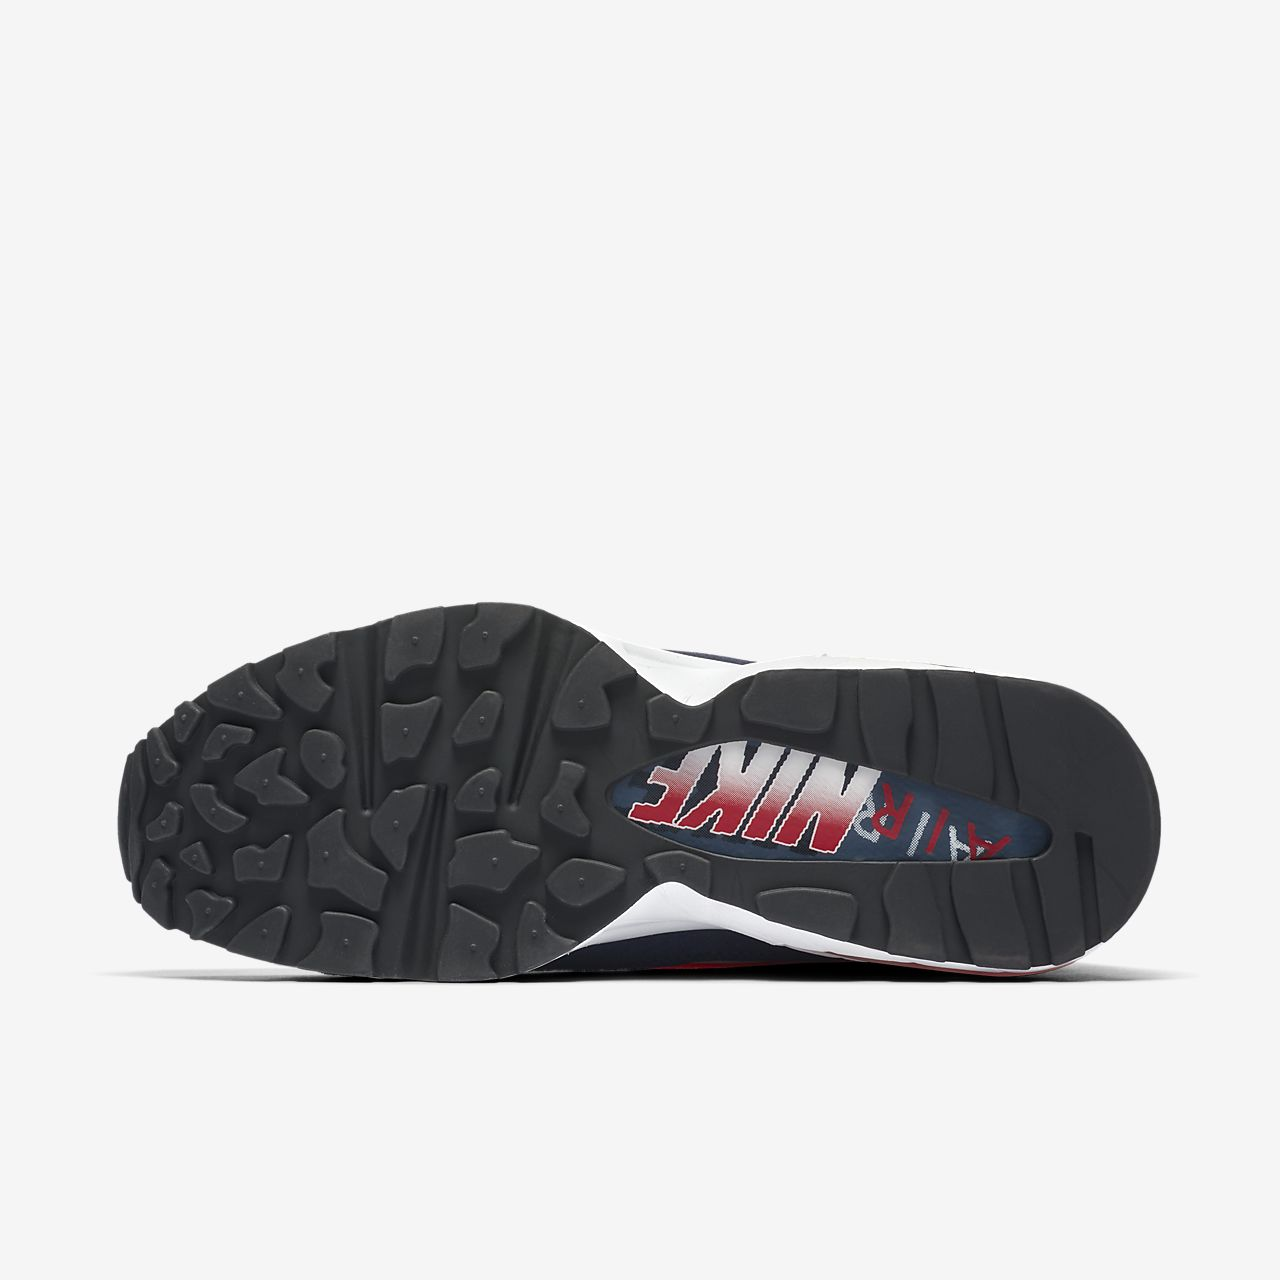 sale retailer c7888 90d0a ... Chaussure Nike Air Max 93 pour Homme